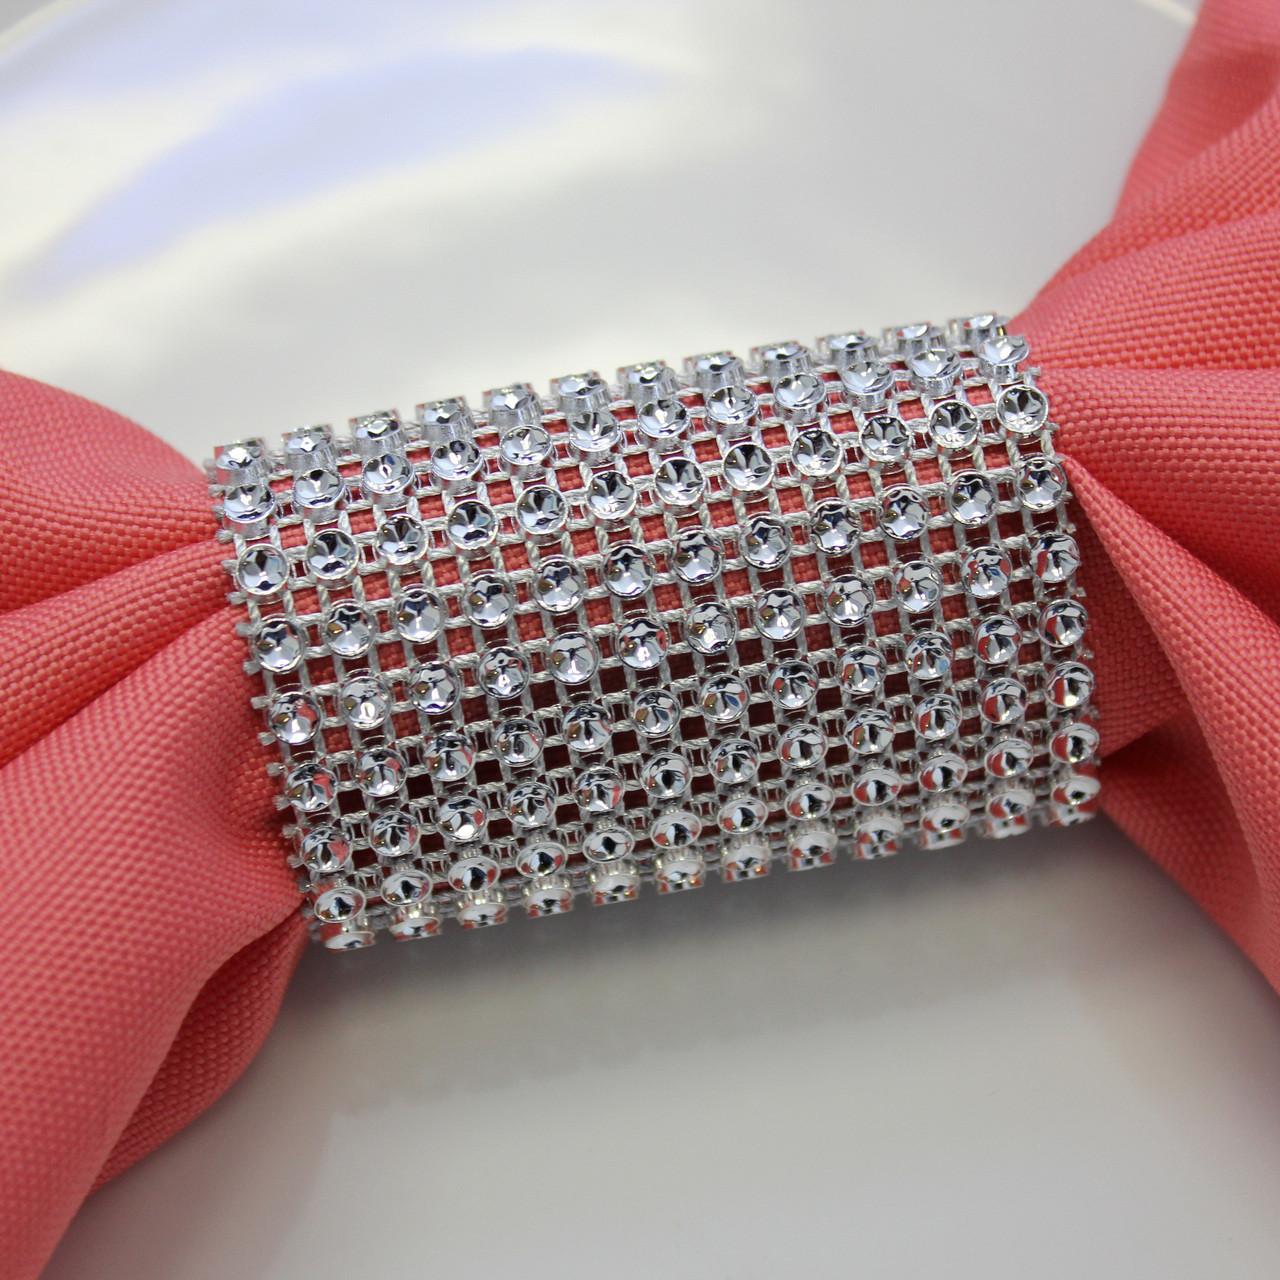 your chair covers inc reviews grey patio dazzling diamond rhinestone sash slip napkin rings